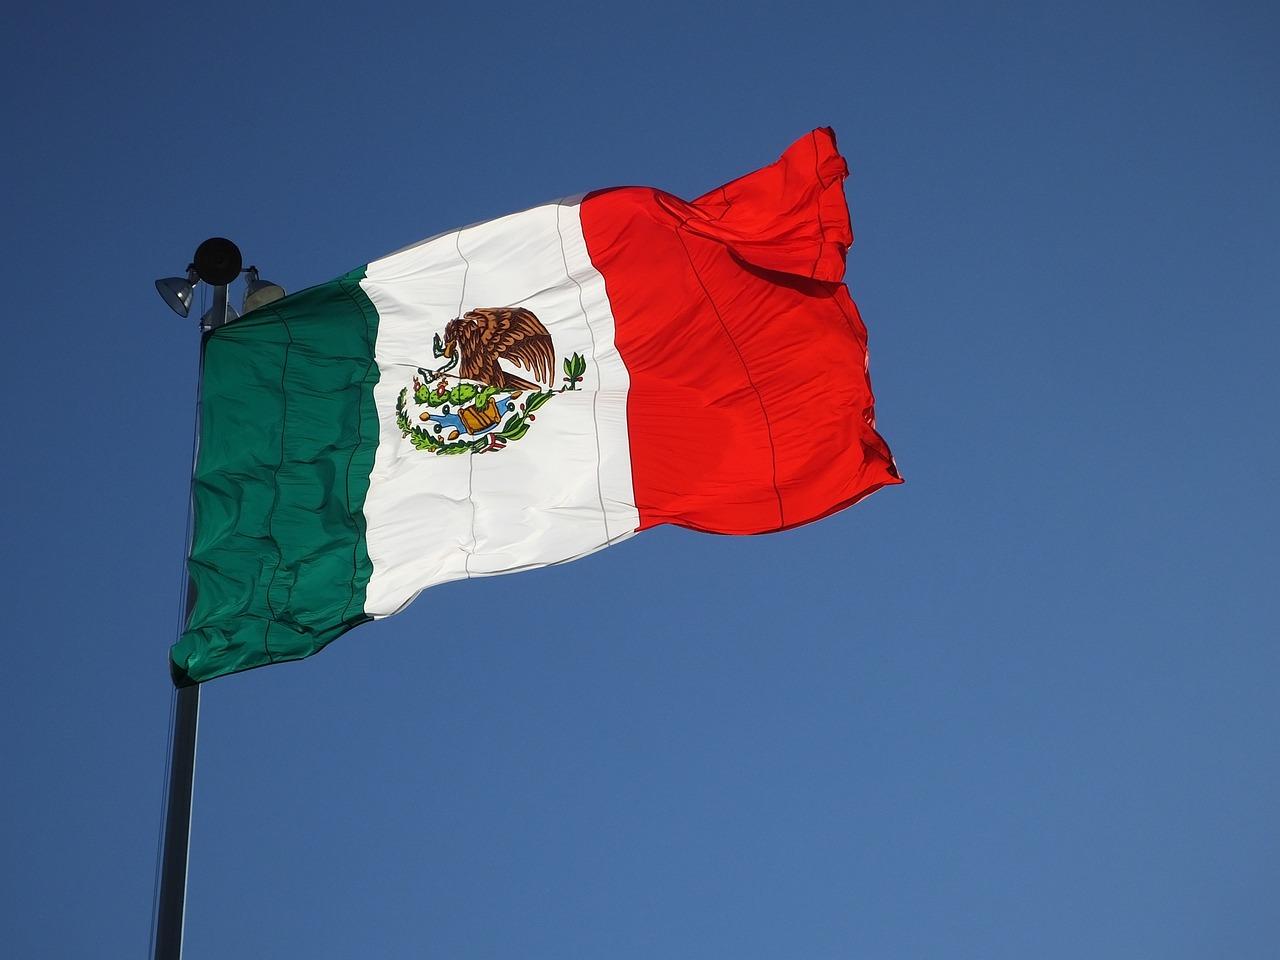 визиток мексиканский флаг фото картинки закончилось волк